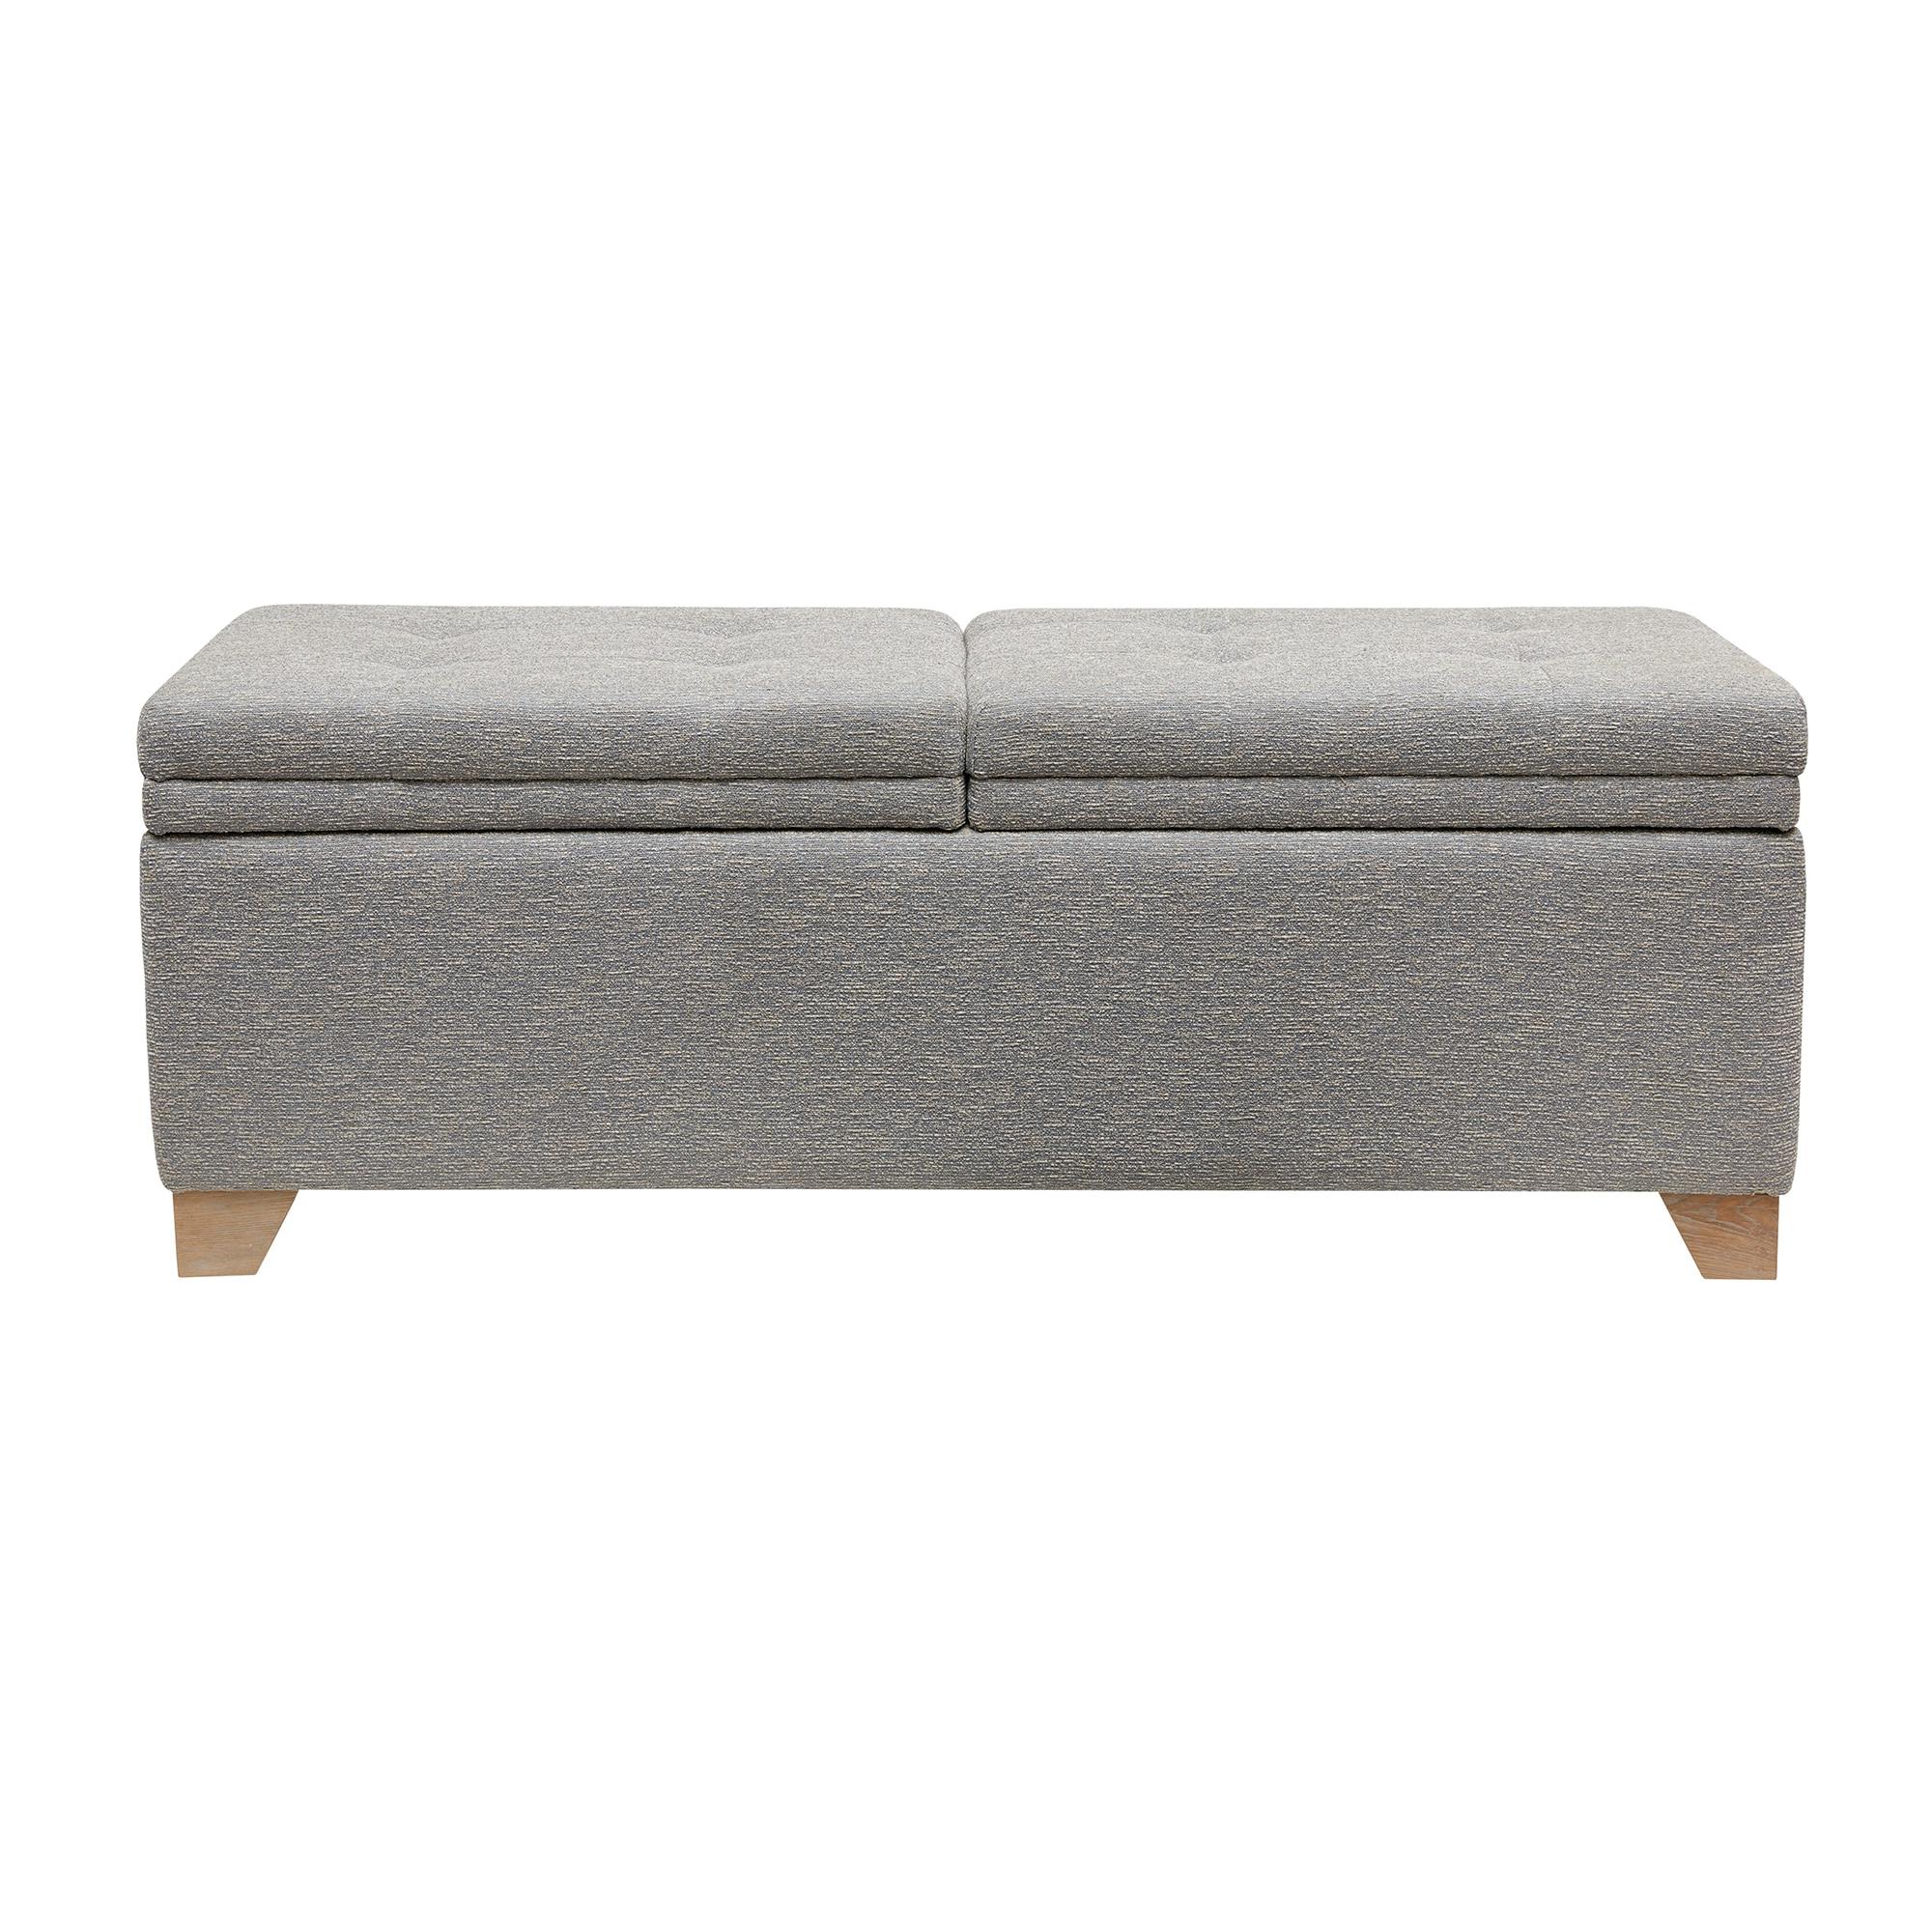 Fashionable Madison Park Jaxon Grey Multi Storage Bench – Walmart Inside Jaxon Grey Sideboards (Gallery 15 of 20)